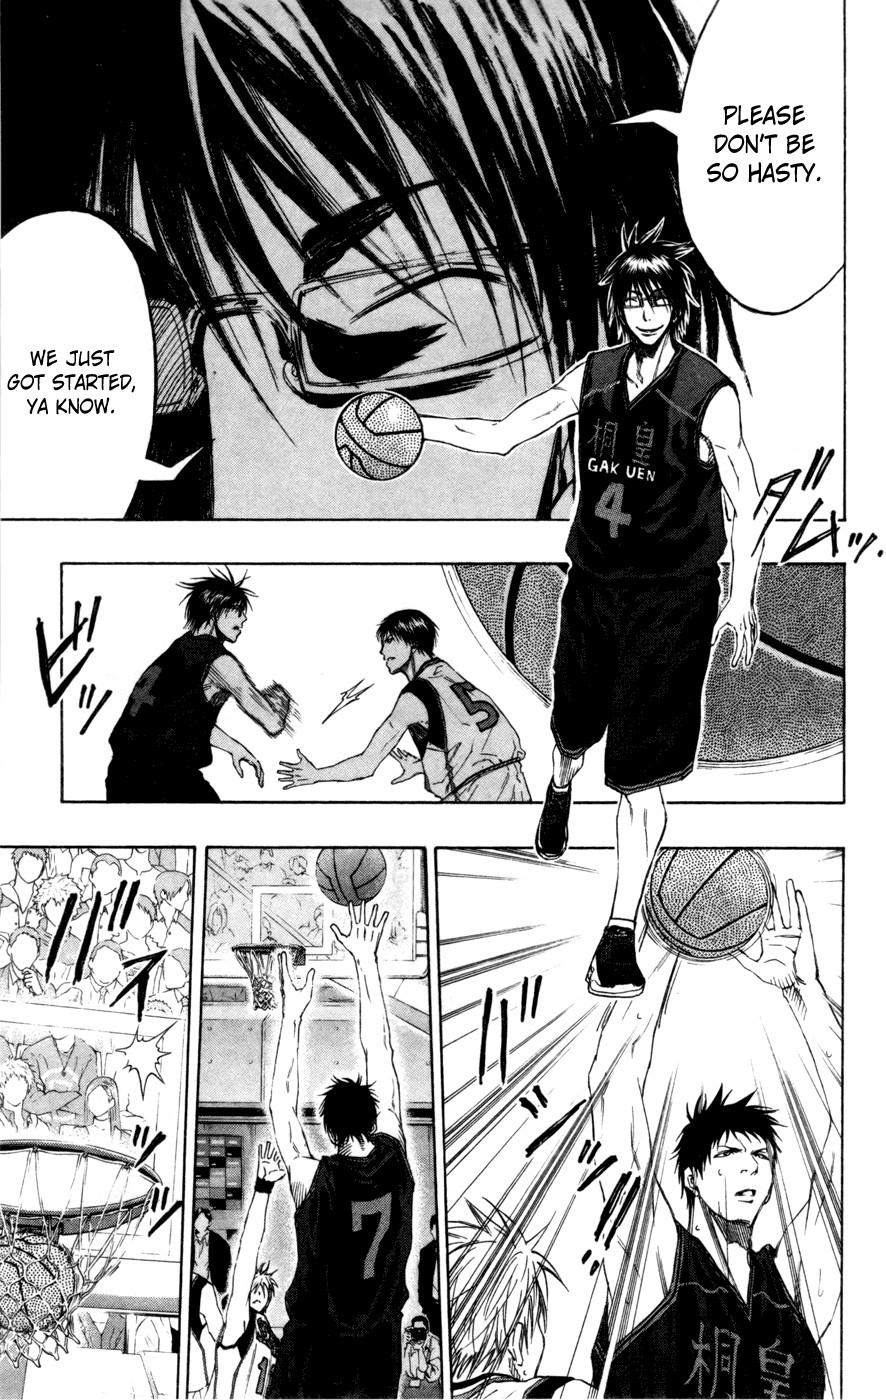 Kuroko no Basket Manga Chapter 116 - Image 12